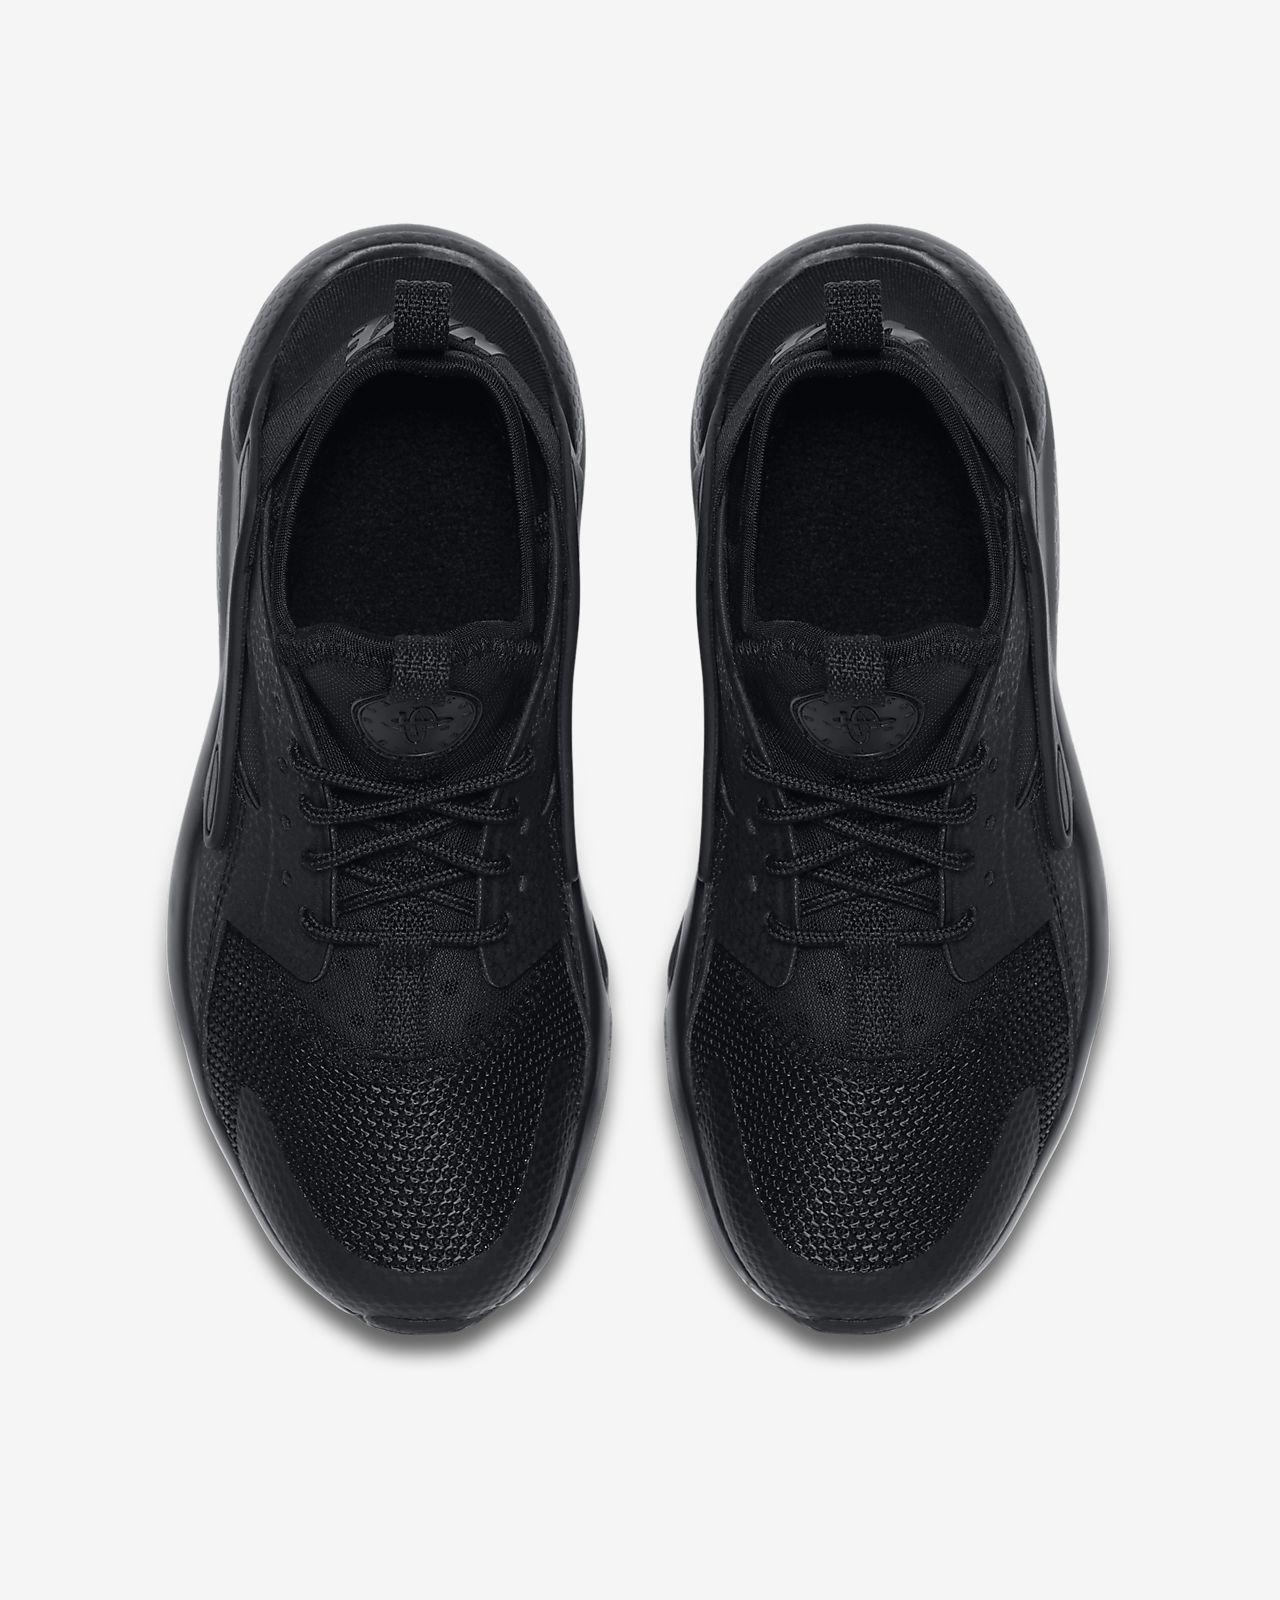 Nike Jordan Junior High Tops Boys' Size 2.5Y